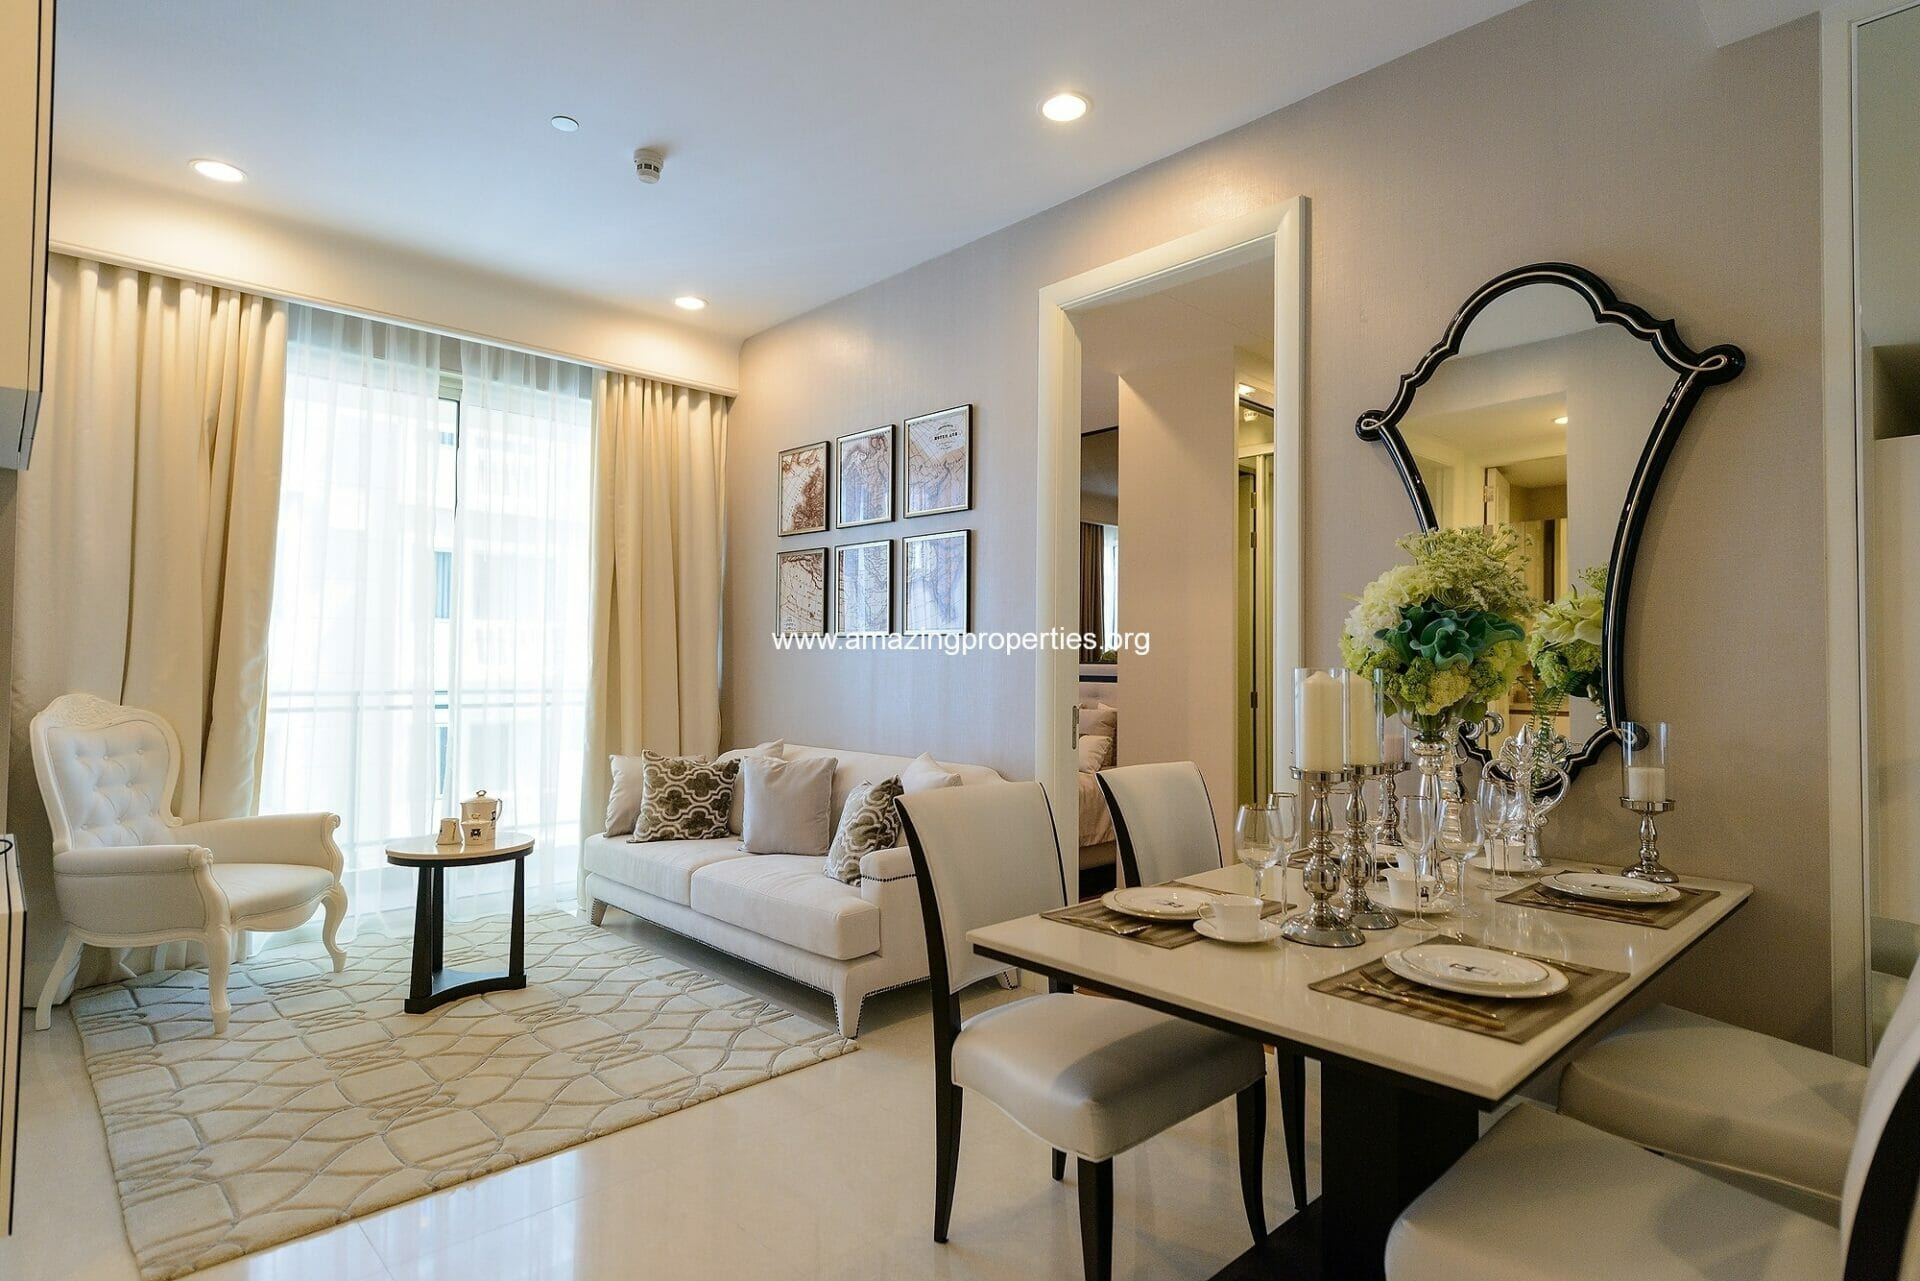 Q Langsuan Chidlom 2 Bedroom Condo for rent